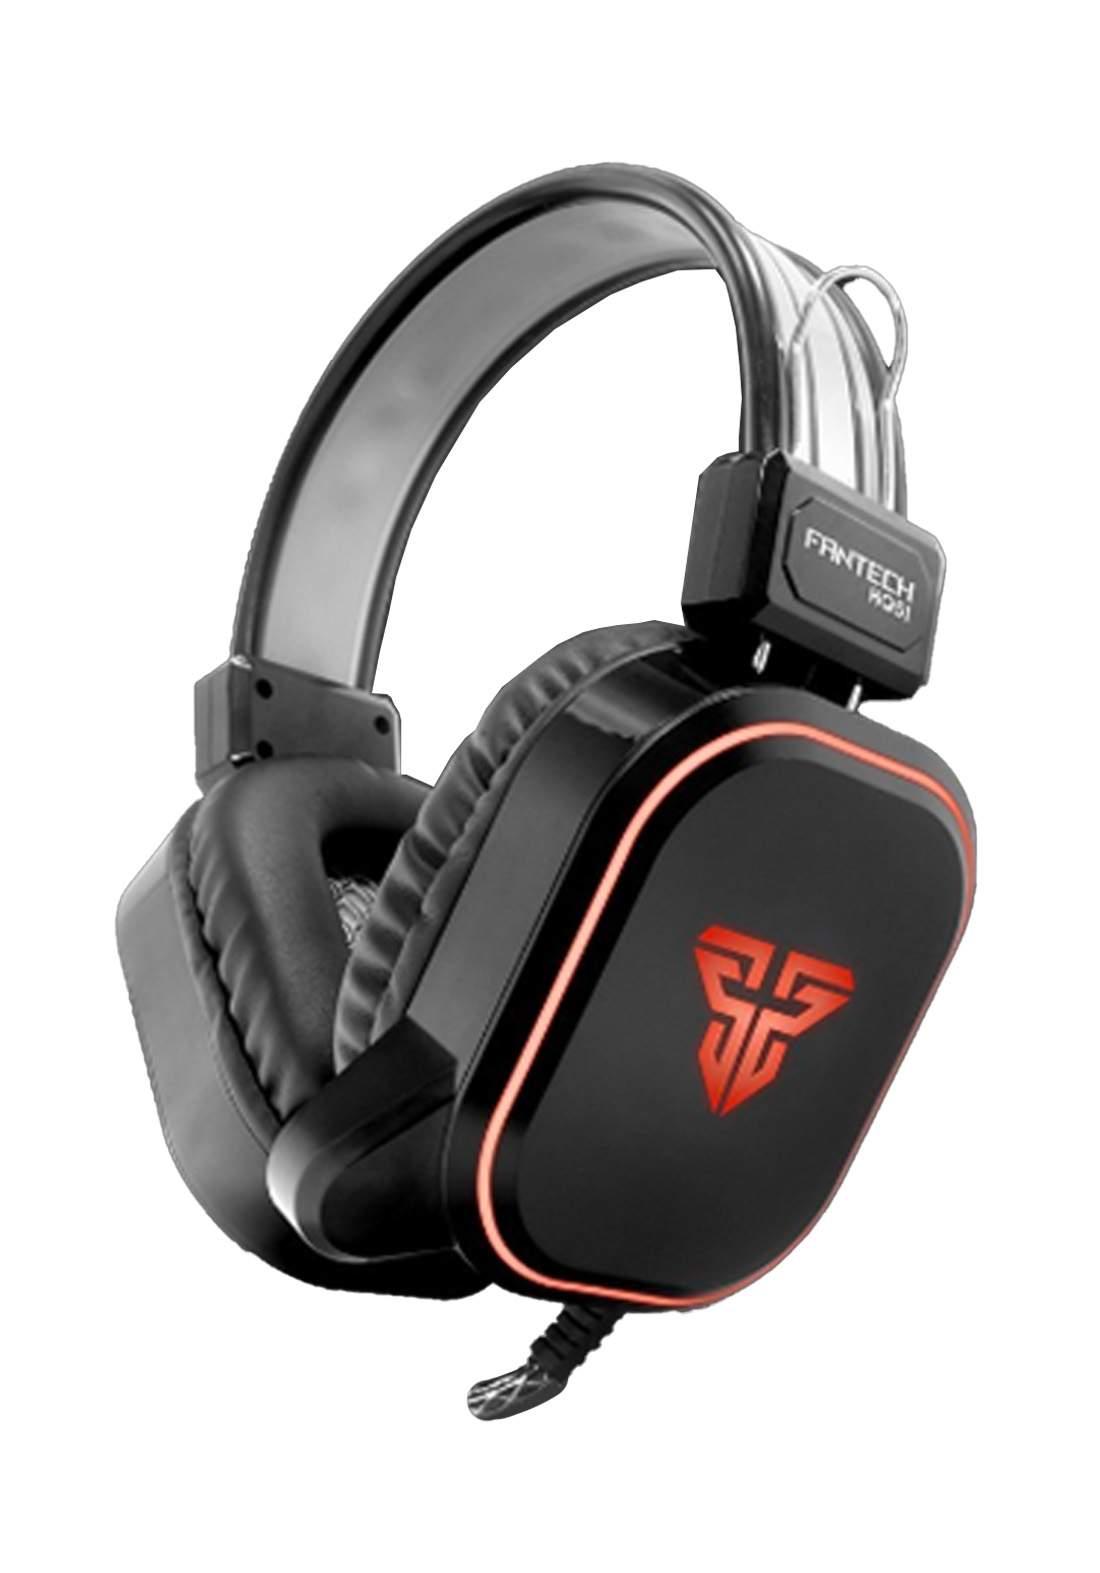 Fantech HQ51 Legion RGB Gaming Headset - Black سماعة